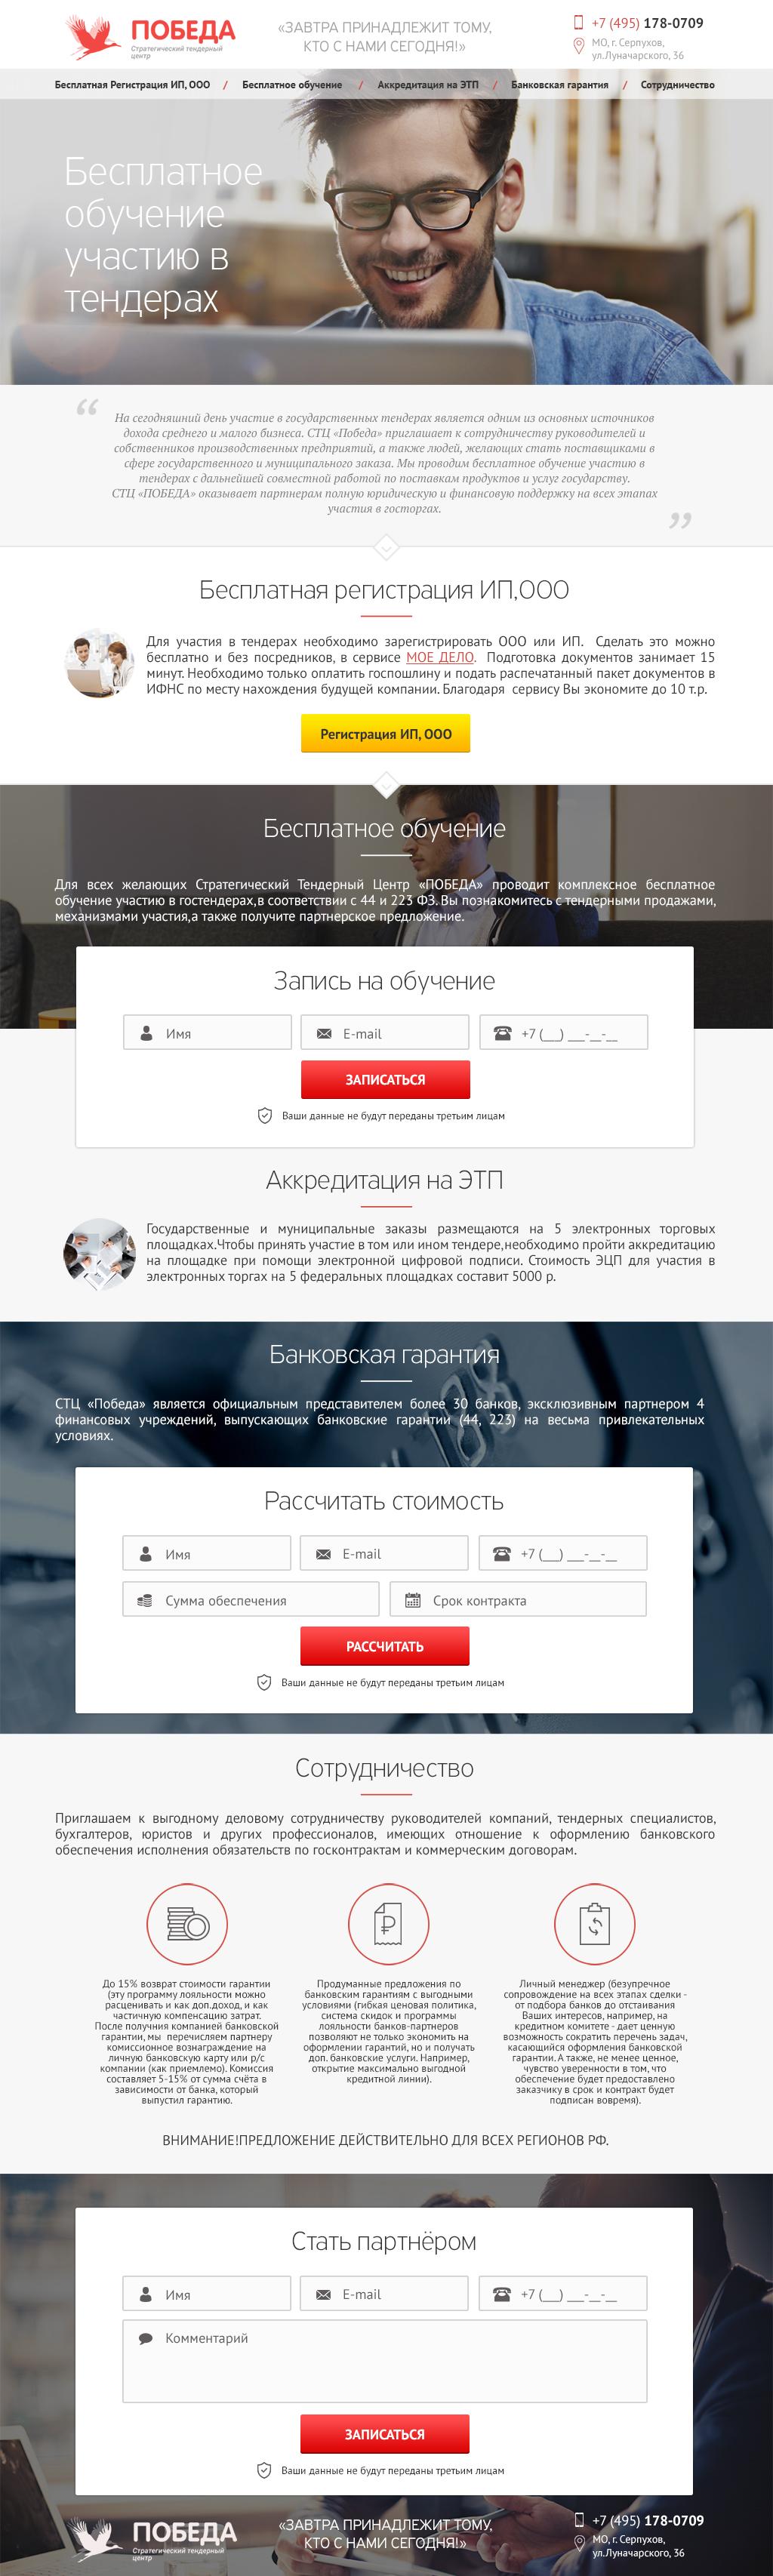 "Landing page СТЦ ""Победа"""